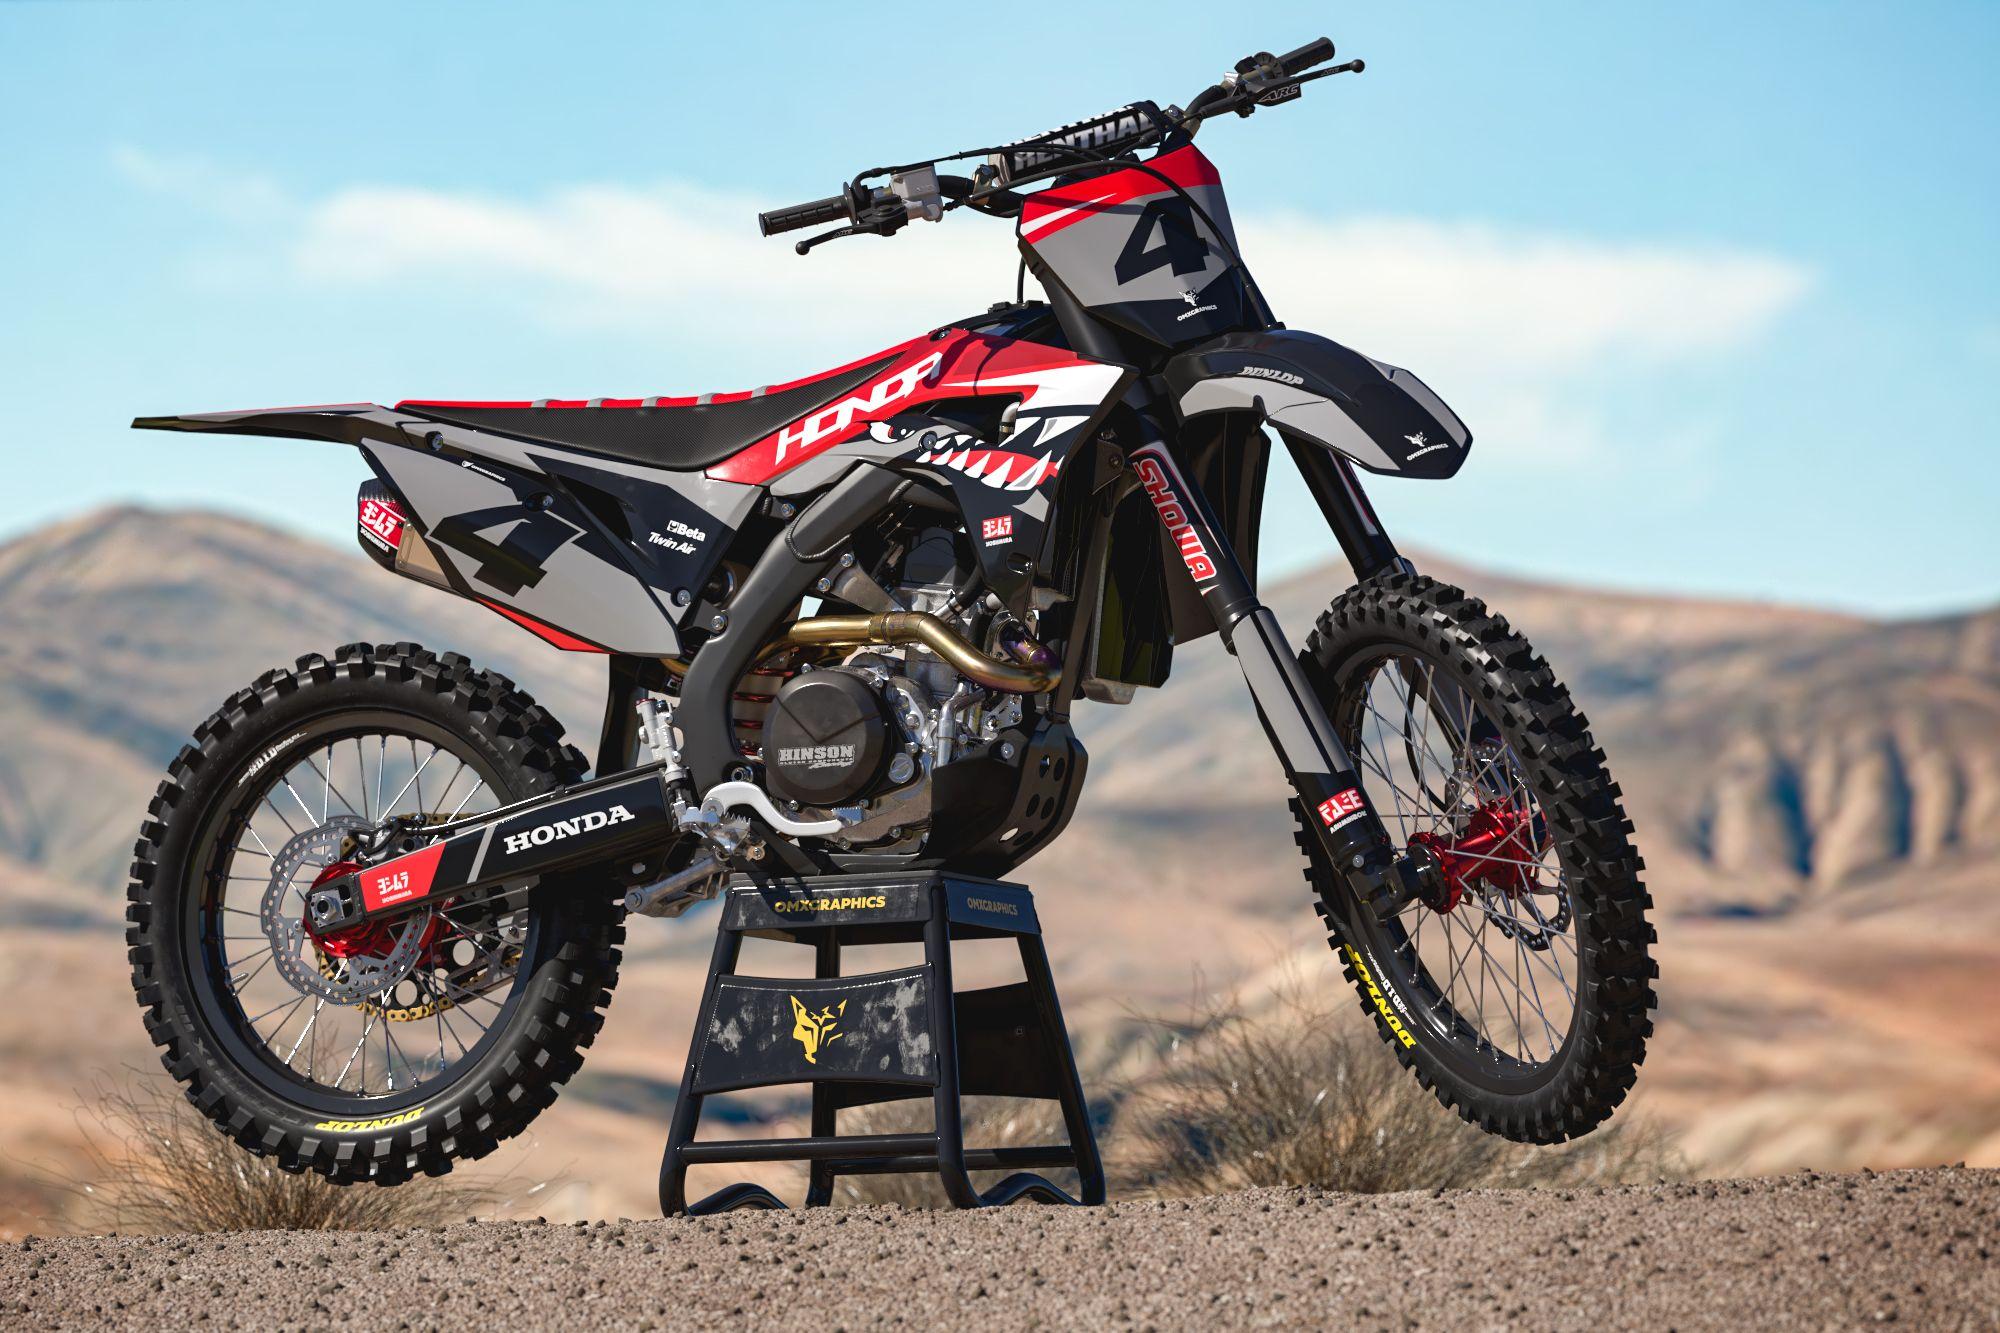 Honda Mx Graphics Shark Omxgraphics In 2020 Honda Dirt Bike Custom Dirt Bike Motocross Bikes